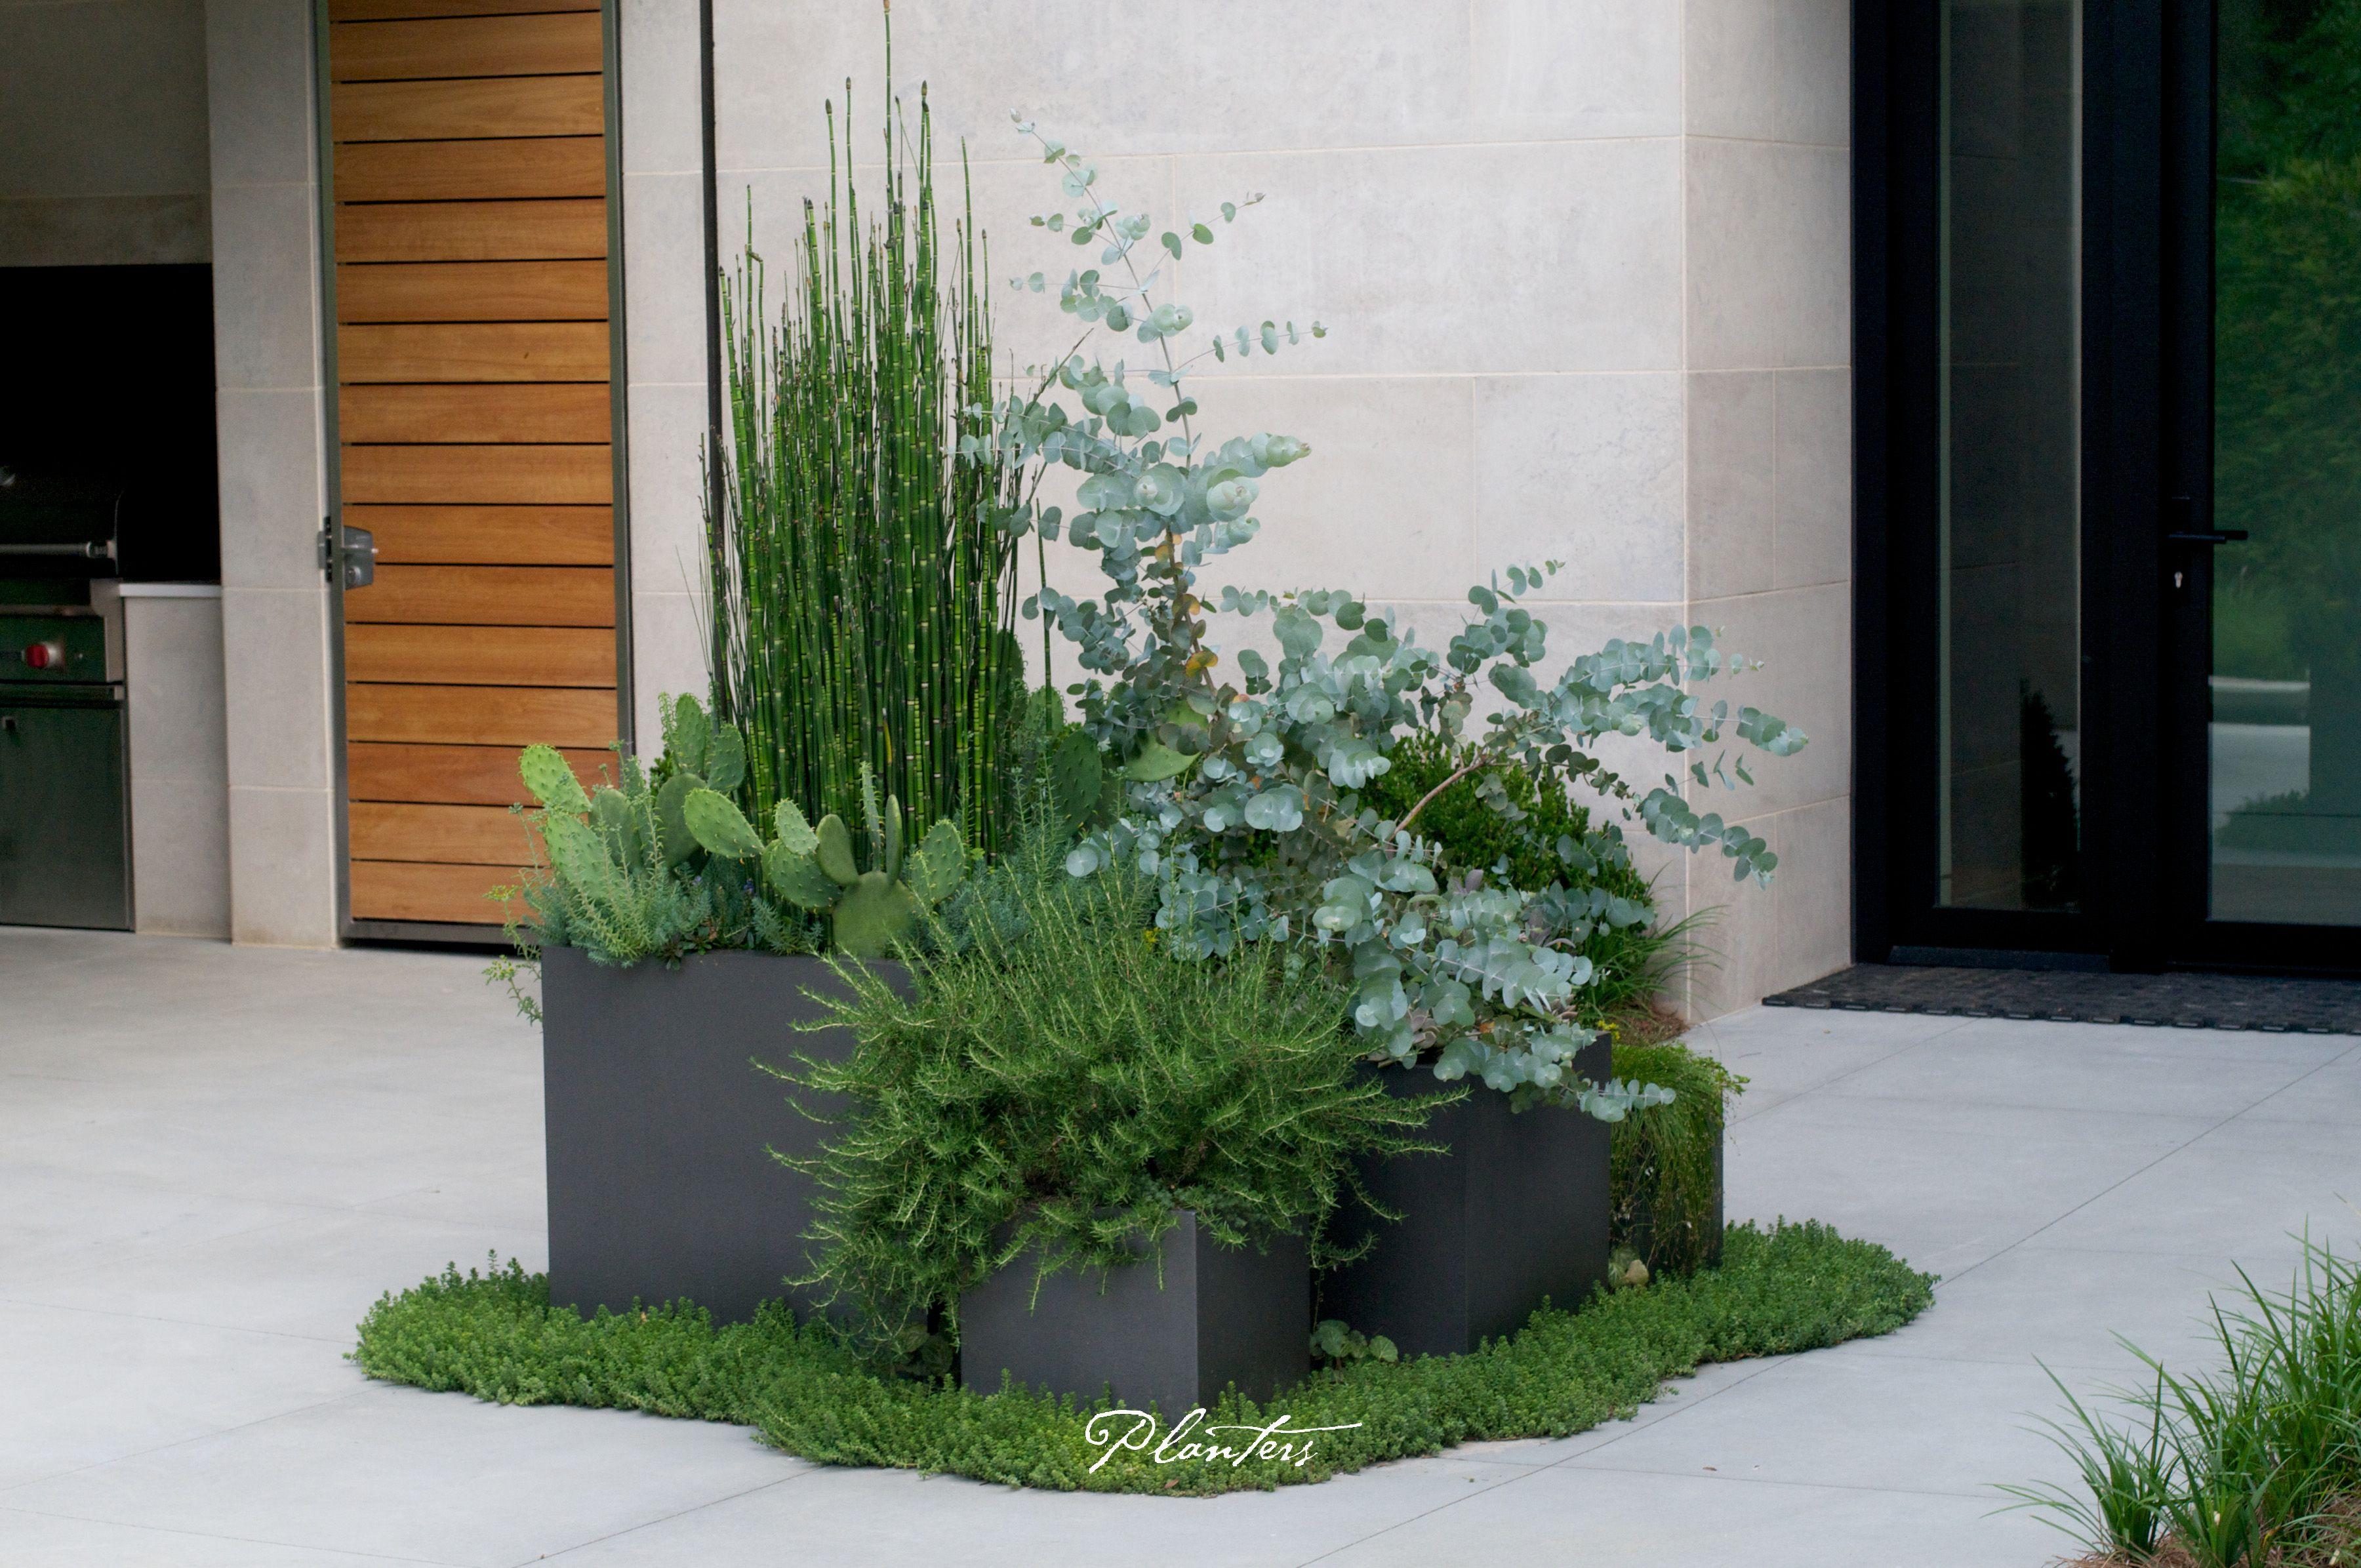 contemporary lead pots using textural plants including equisetum horsetail grass rosmarinus. Black Bedroom Furniture Sets. Home Design Ideas